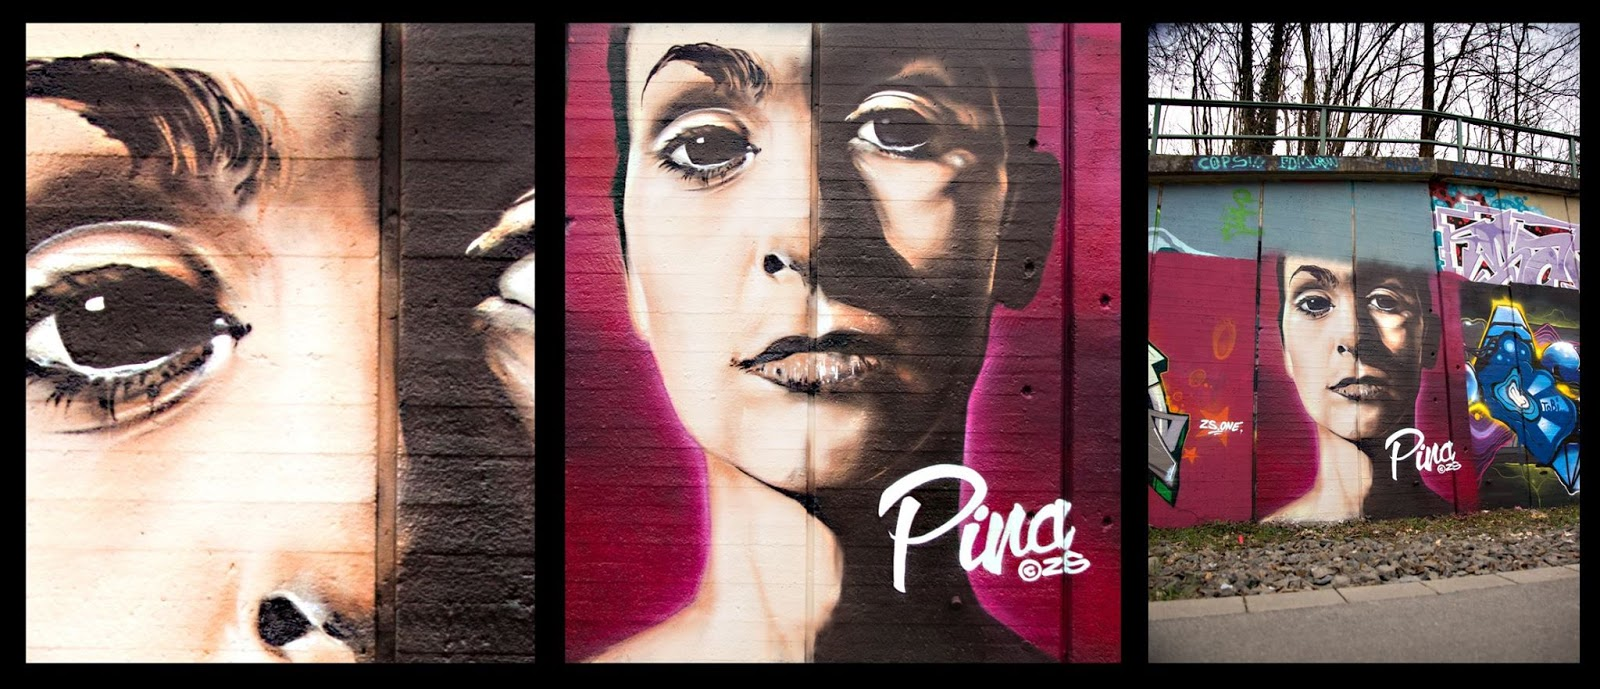 Atomlabor Blog StreetArt -Pina Bausch Streetart von ZS an der Hall of Fame in Wuppertal